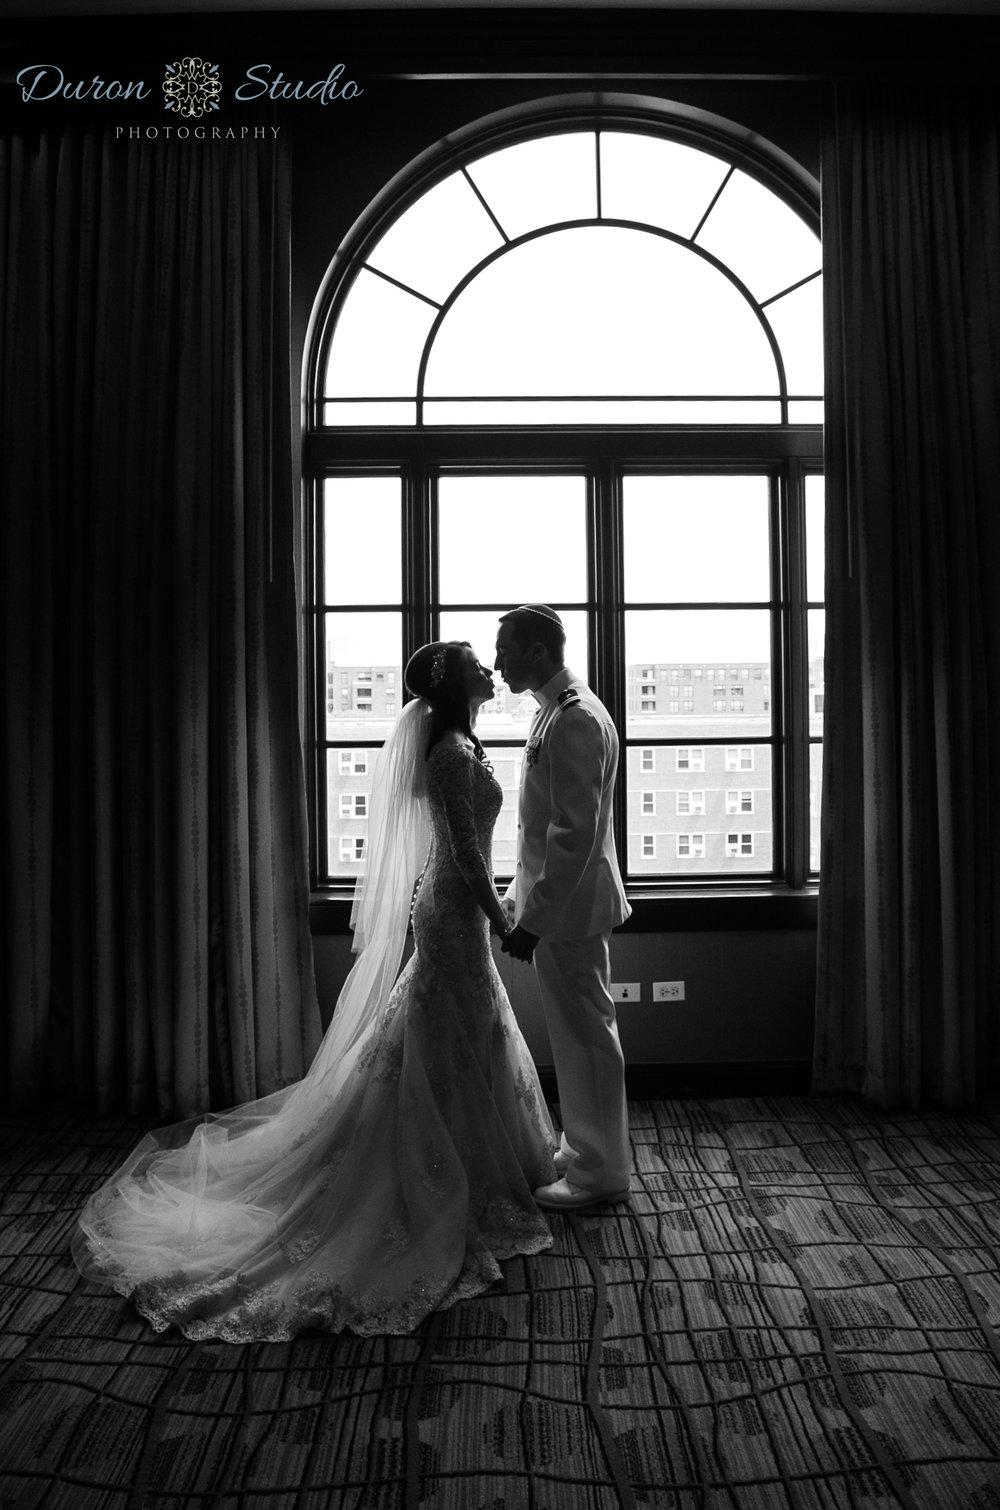 Duron_Studio_weddings12.jpg